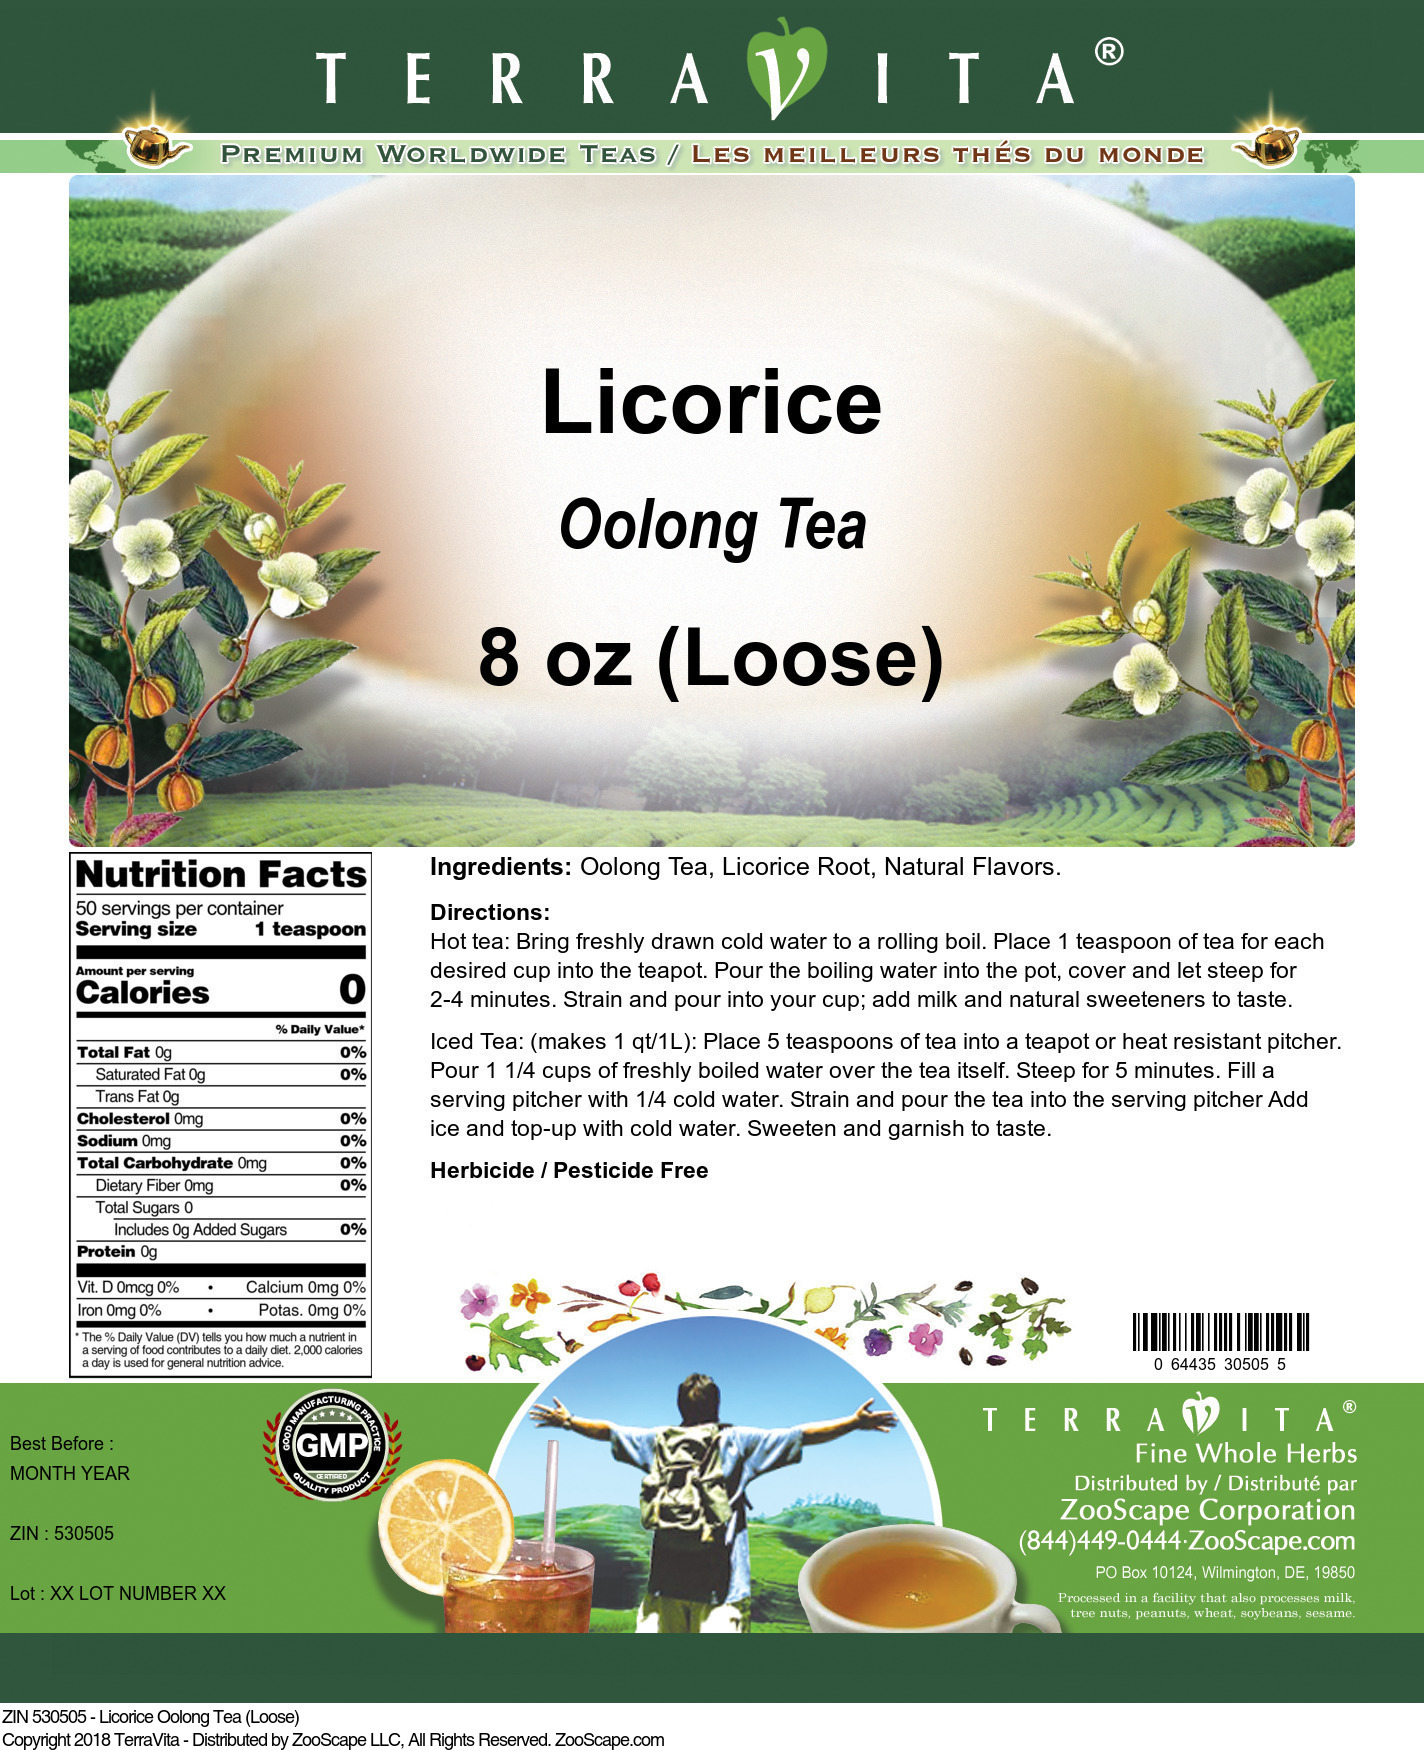 Licorice Oolong Tea (Loose)